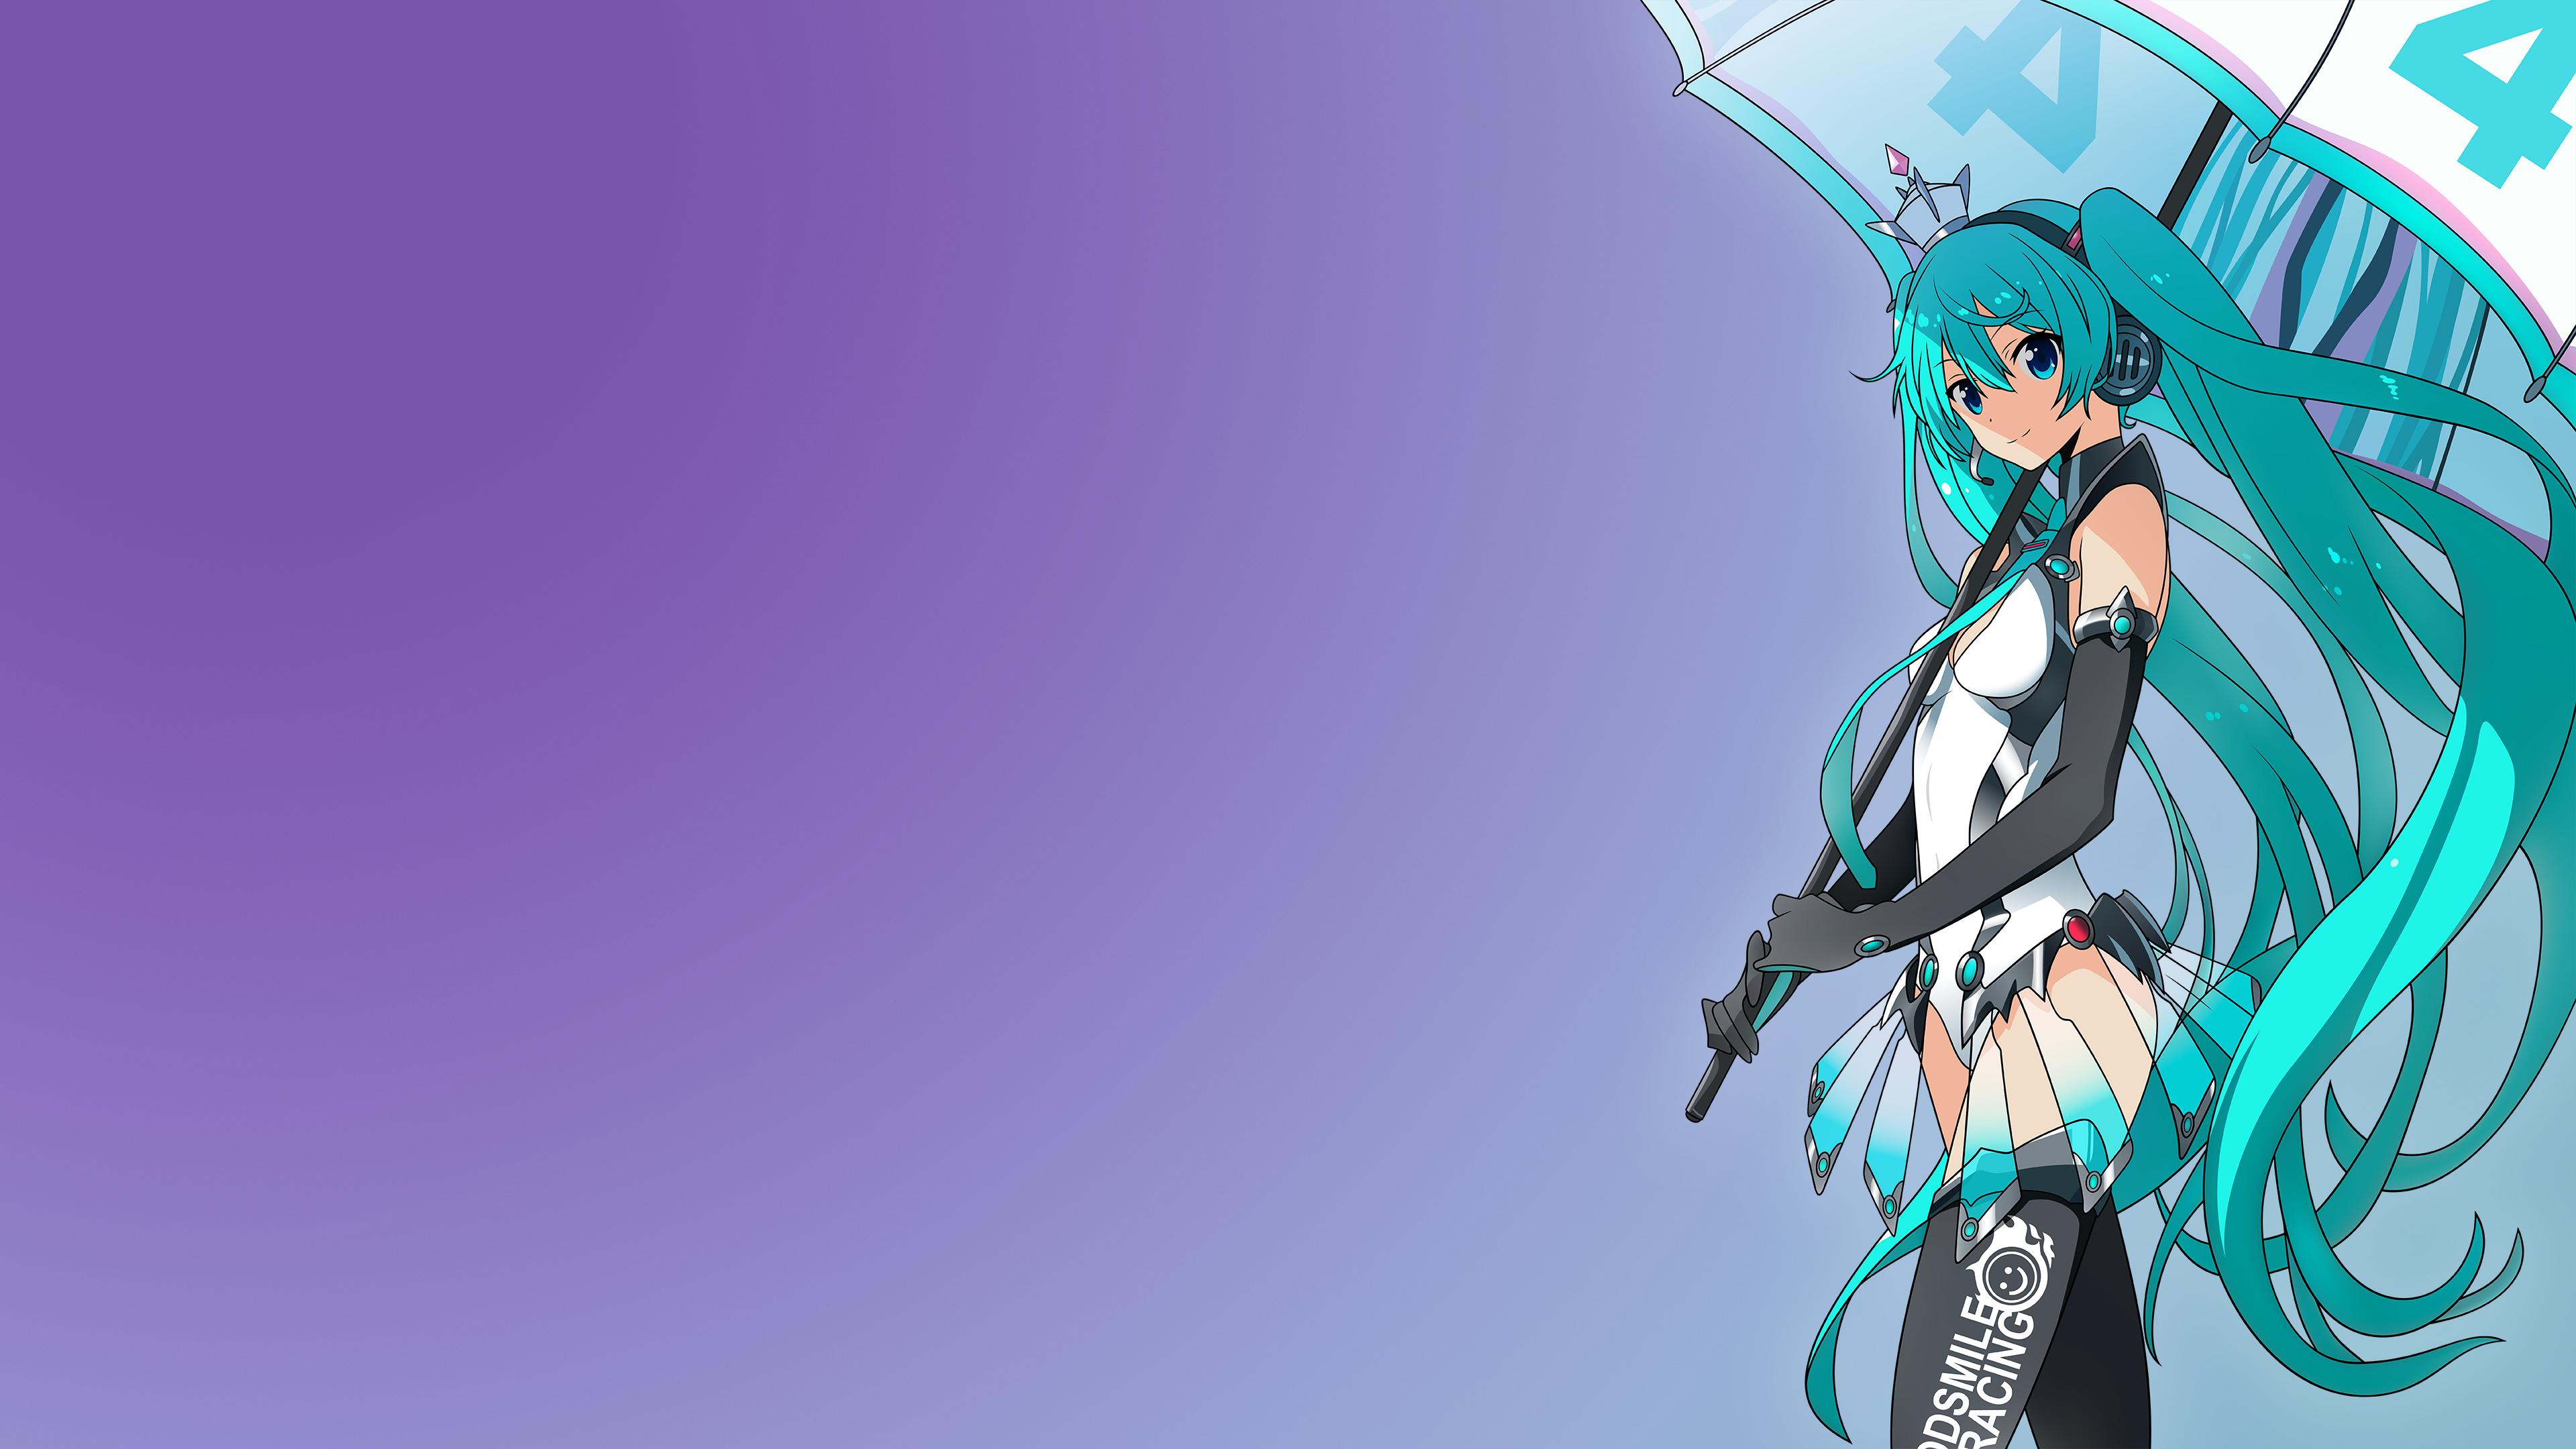 8000 Wallpaper Anime Vektor Hd HD Gratis